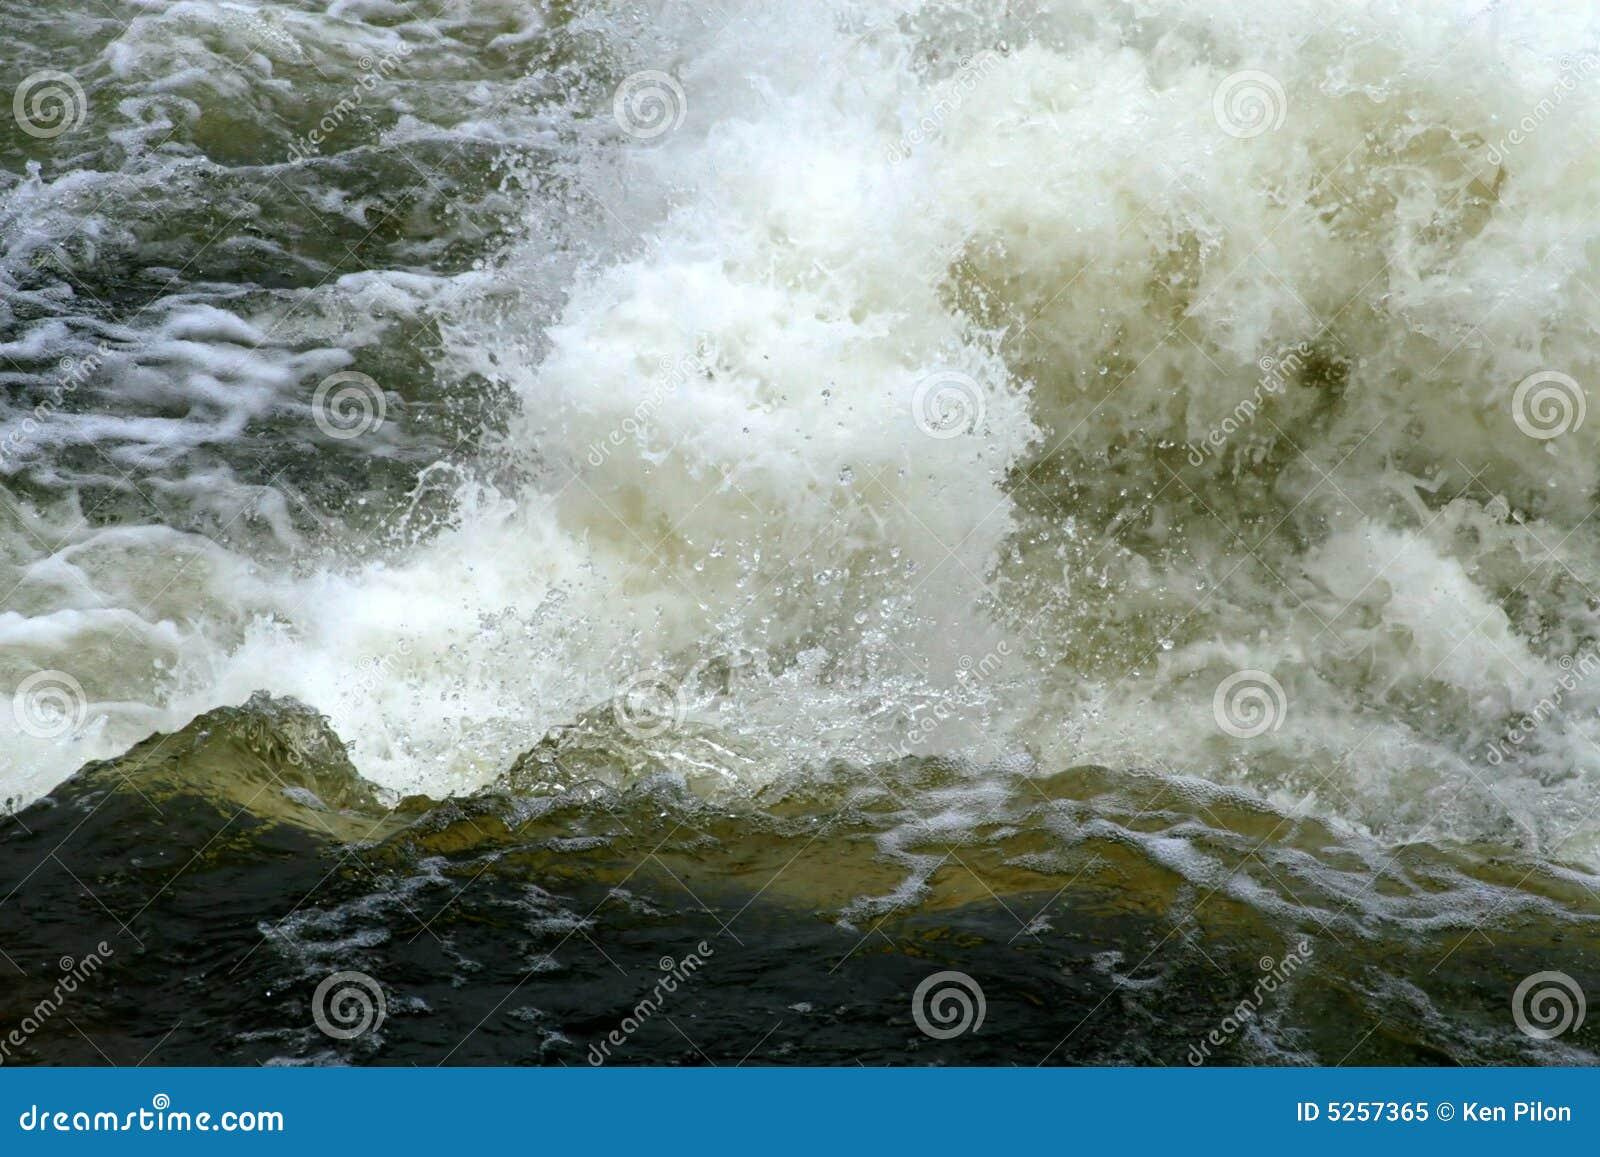 Whitewater rapids